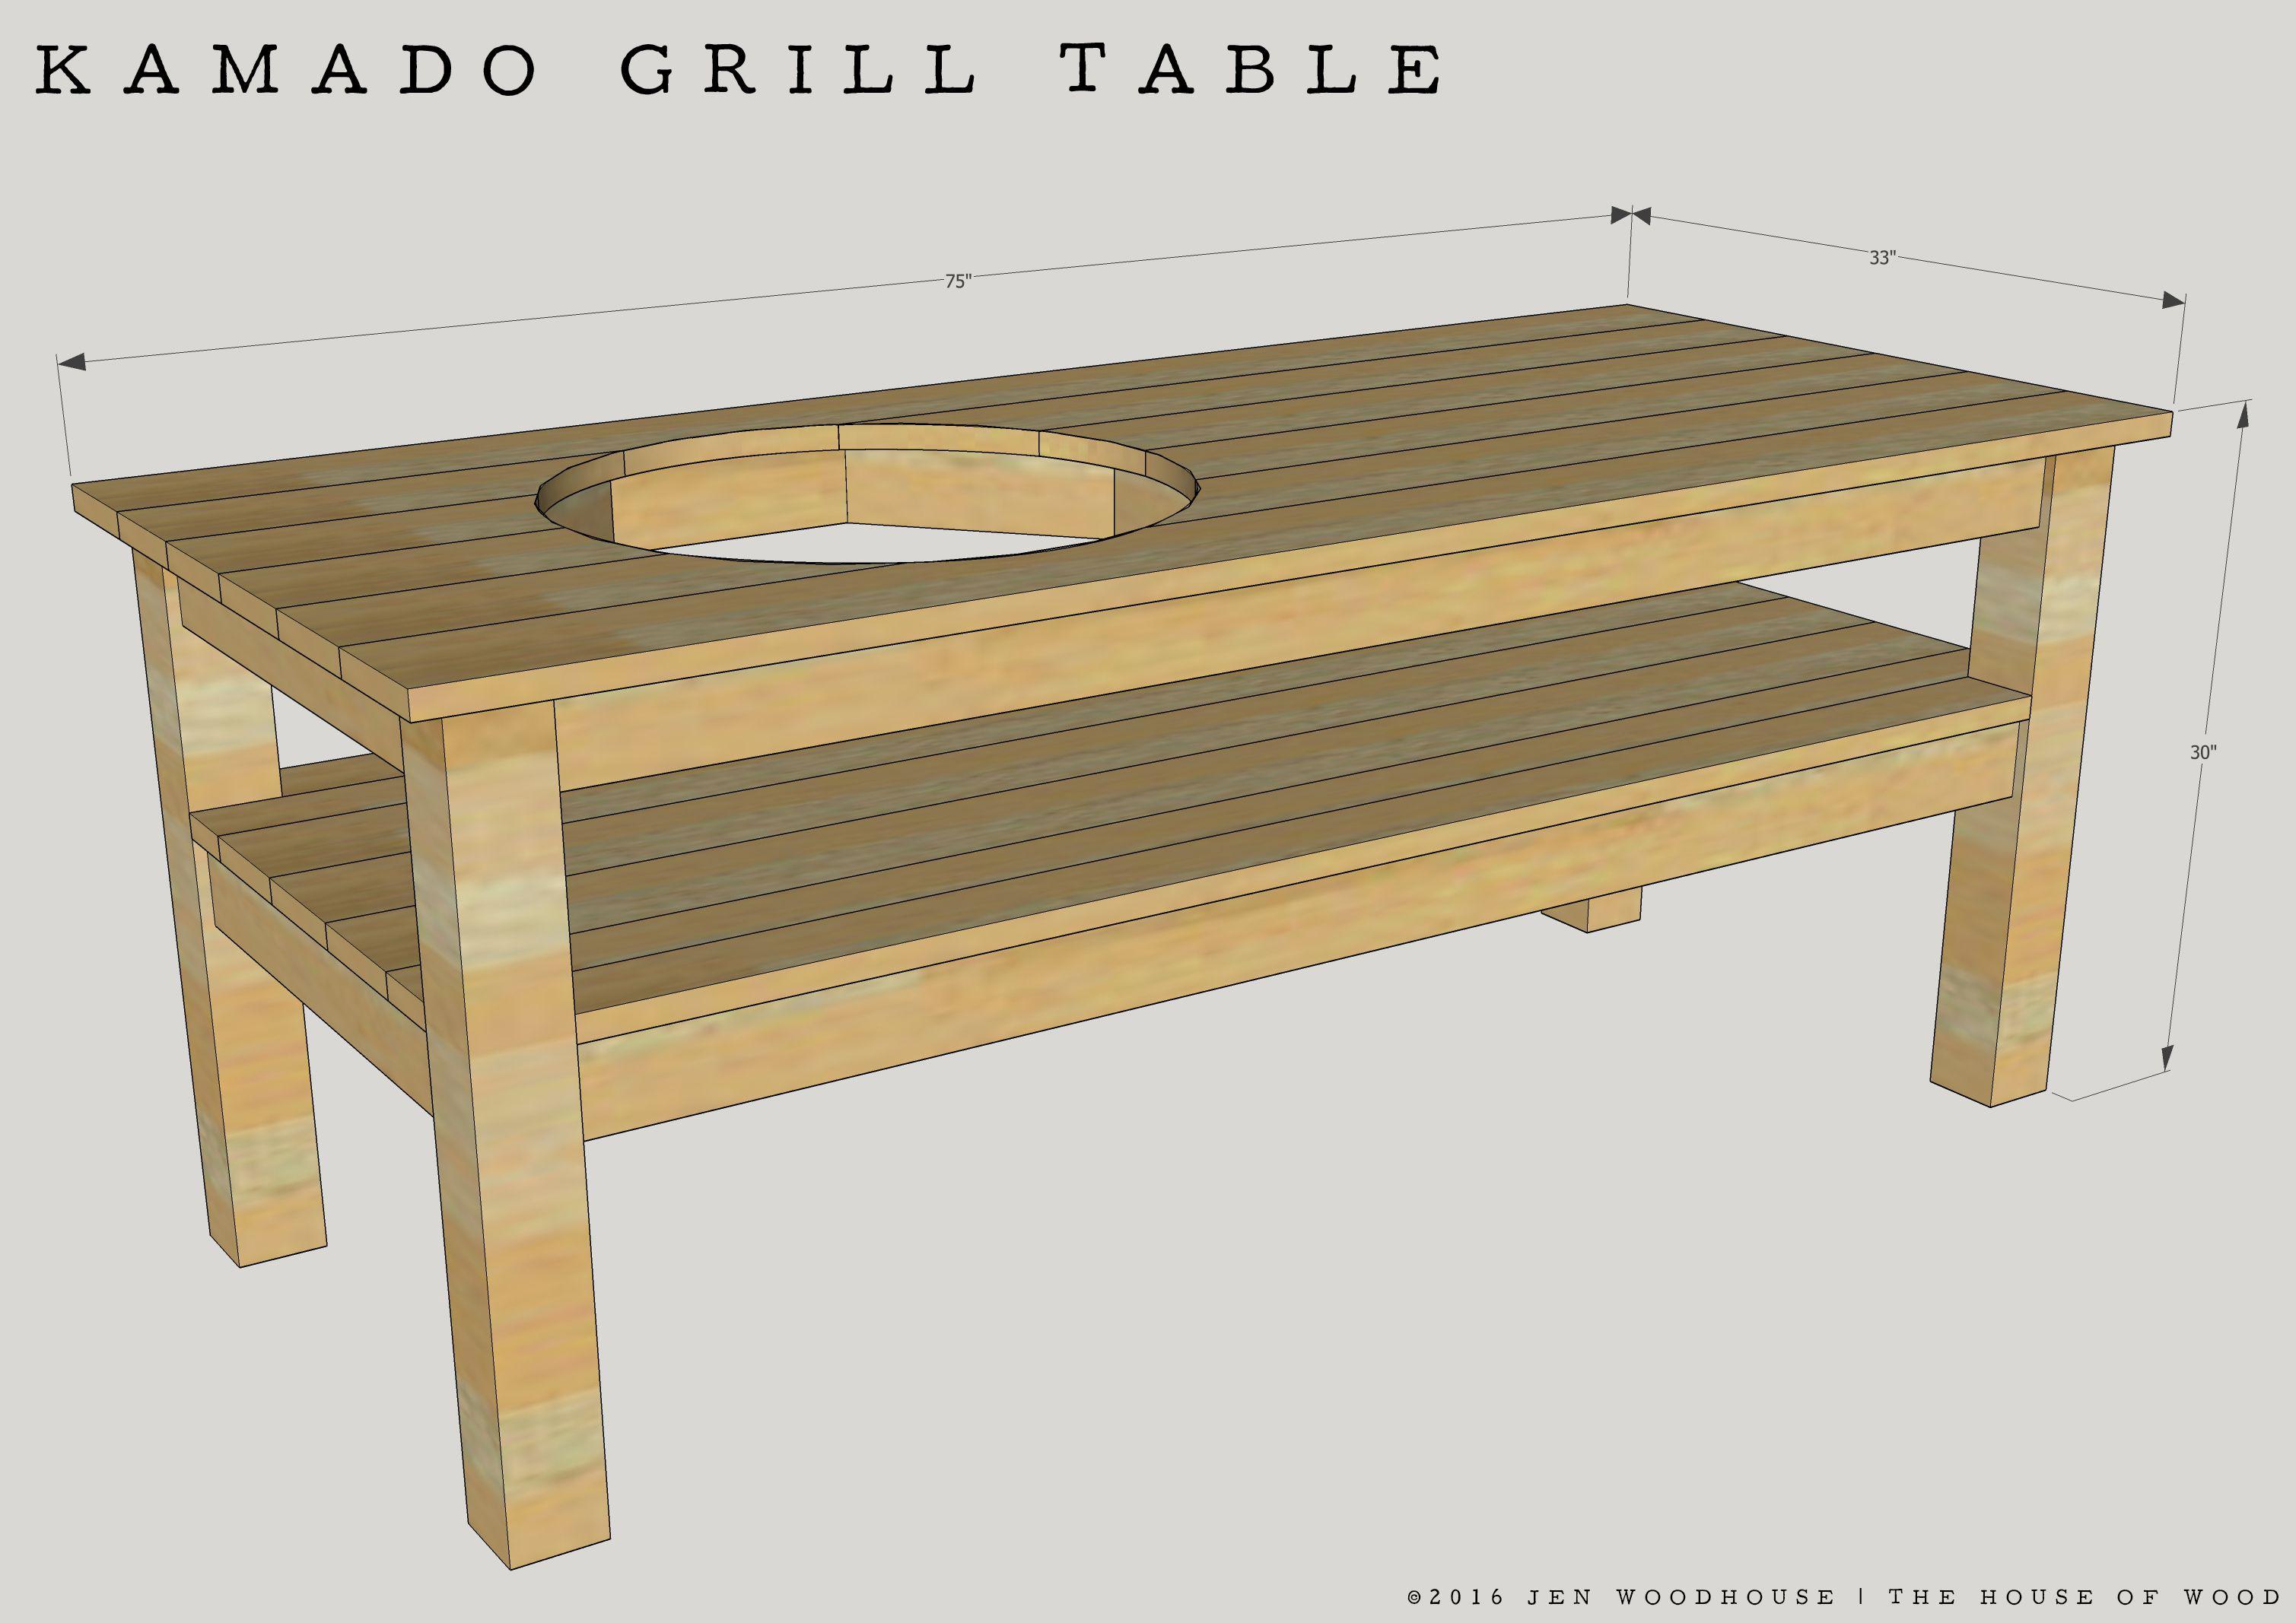 Diy Kamado Grill Table Grill Table Bbq Table Kamado Grill